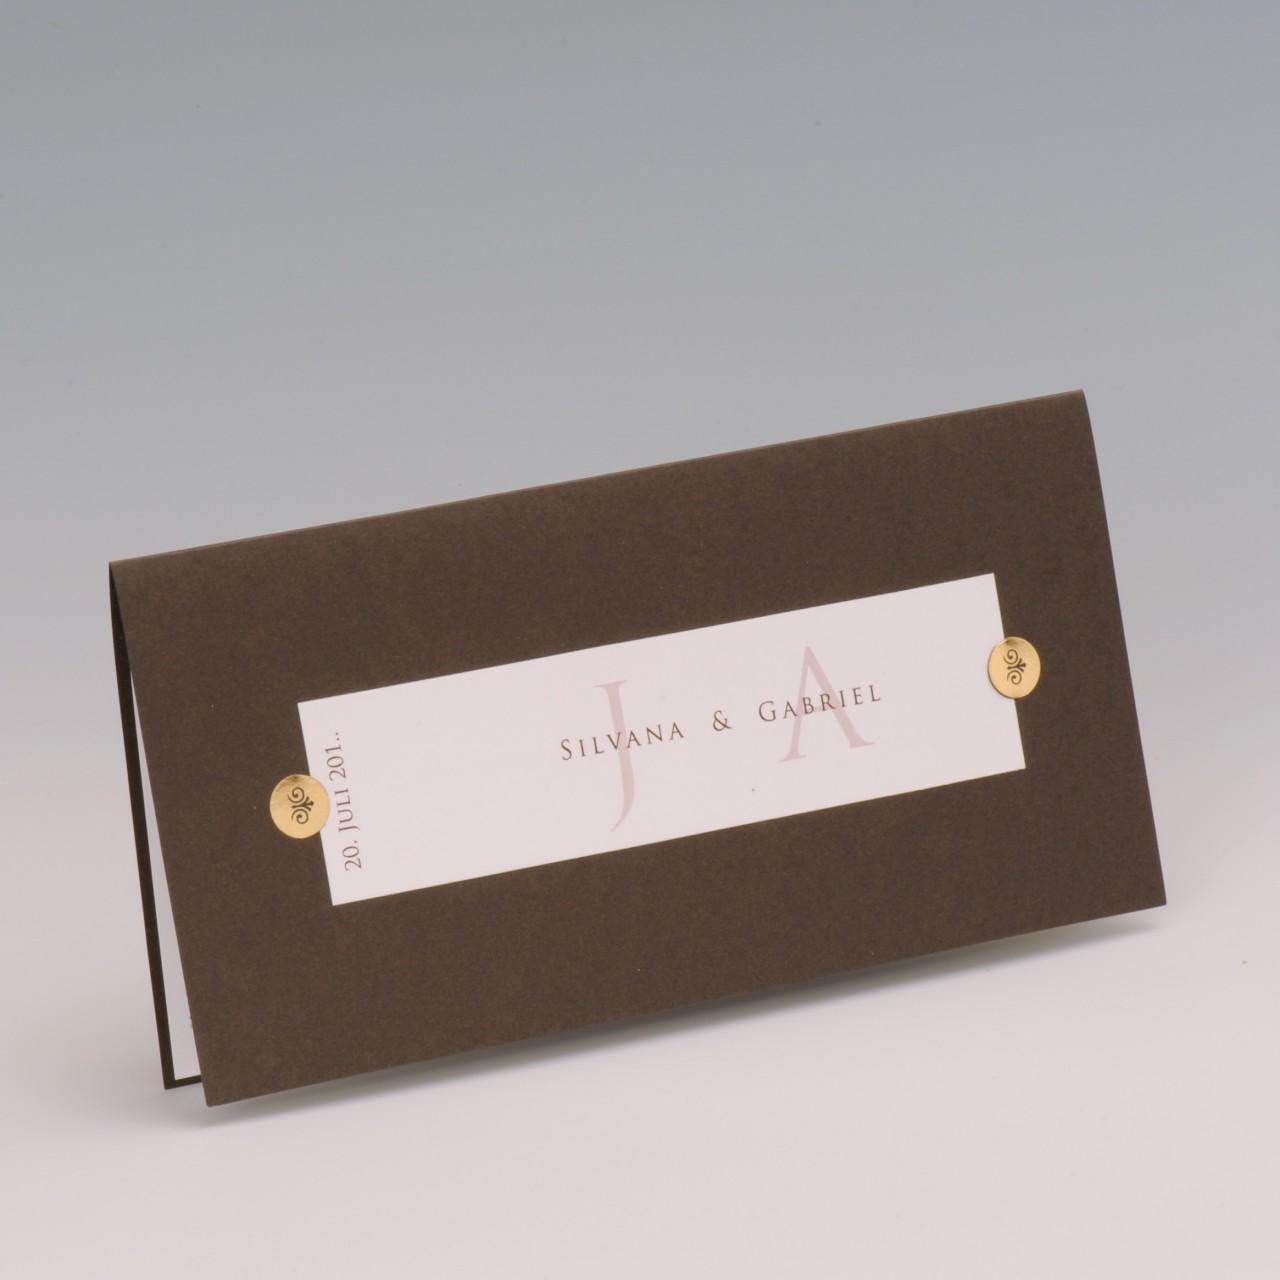 Einladungskarte - H 1928